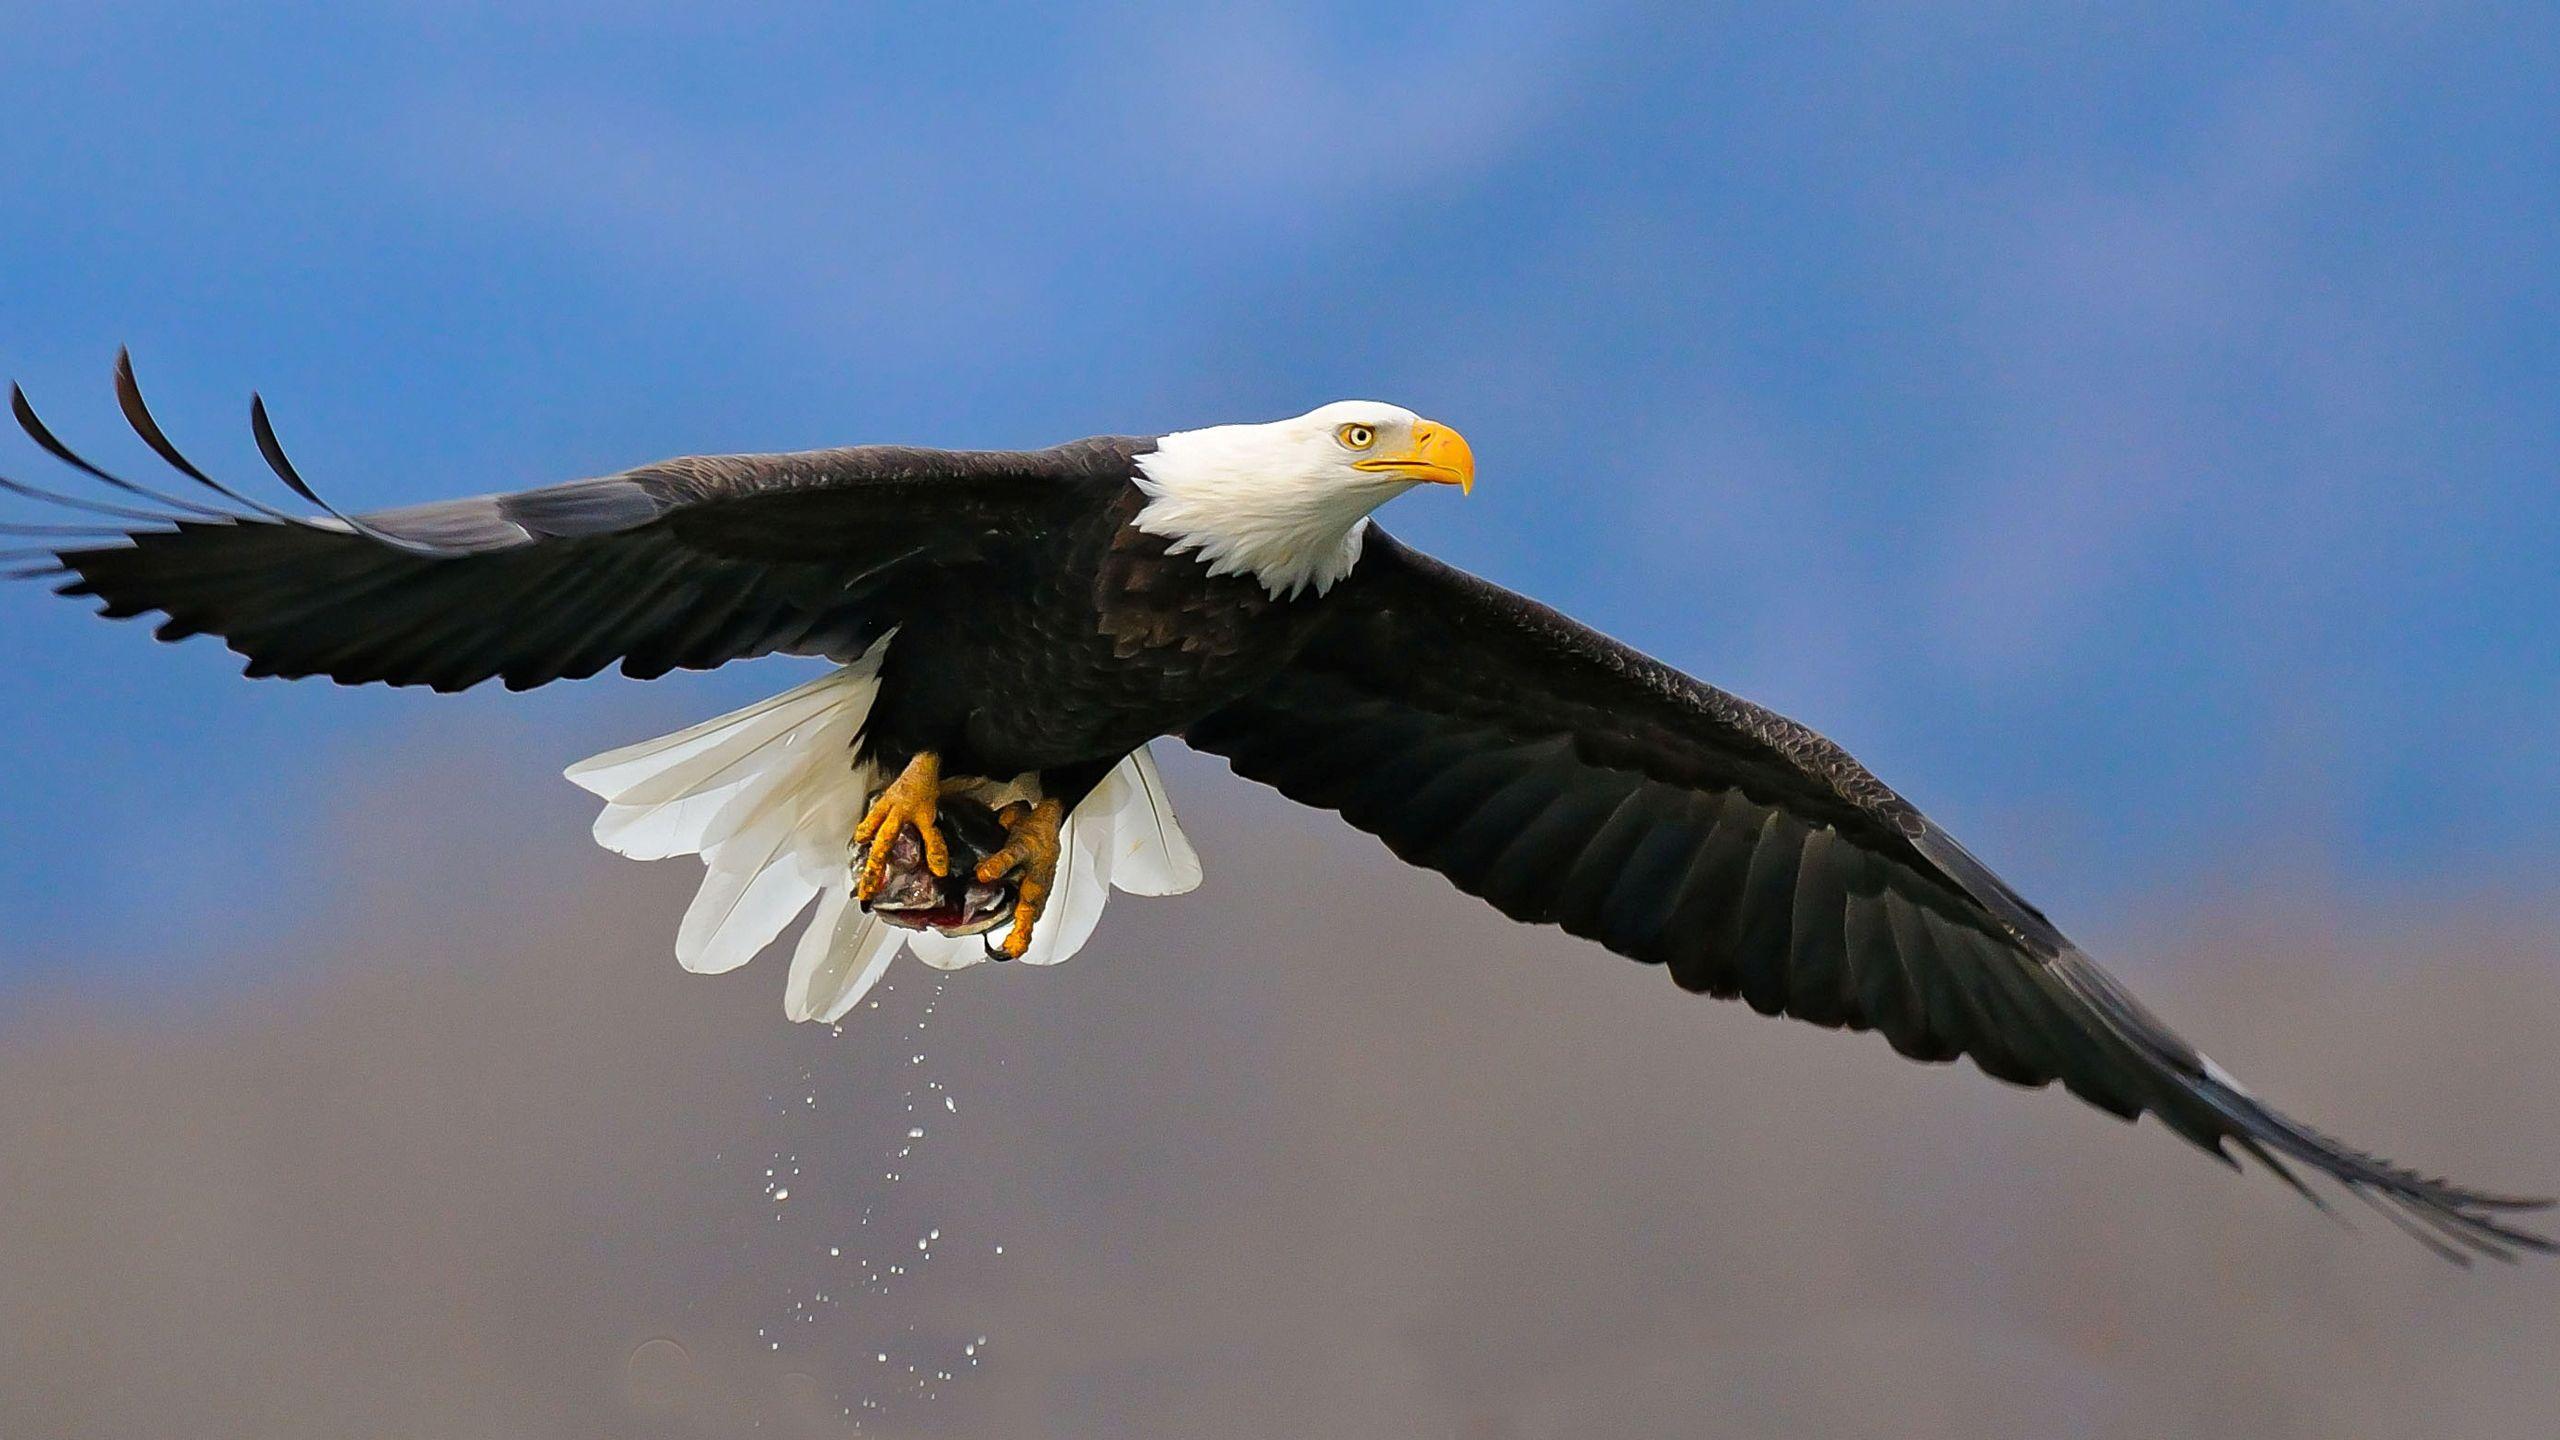 Bald Eagle Wallpaper Eagle Wallpaper Bald Eagle Wallpaper Bald Eagle Eagle wallpaper hd download